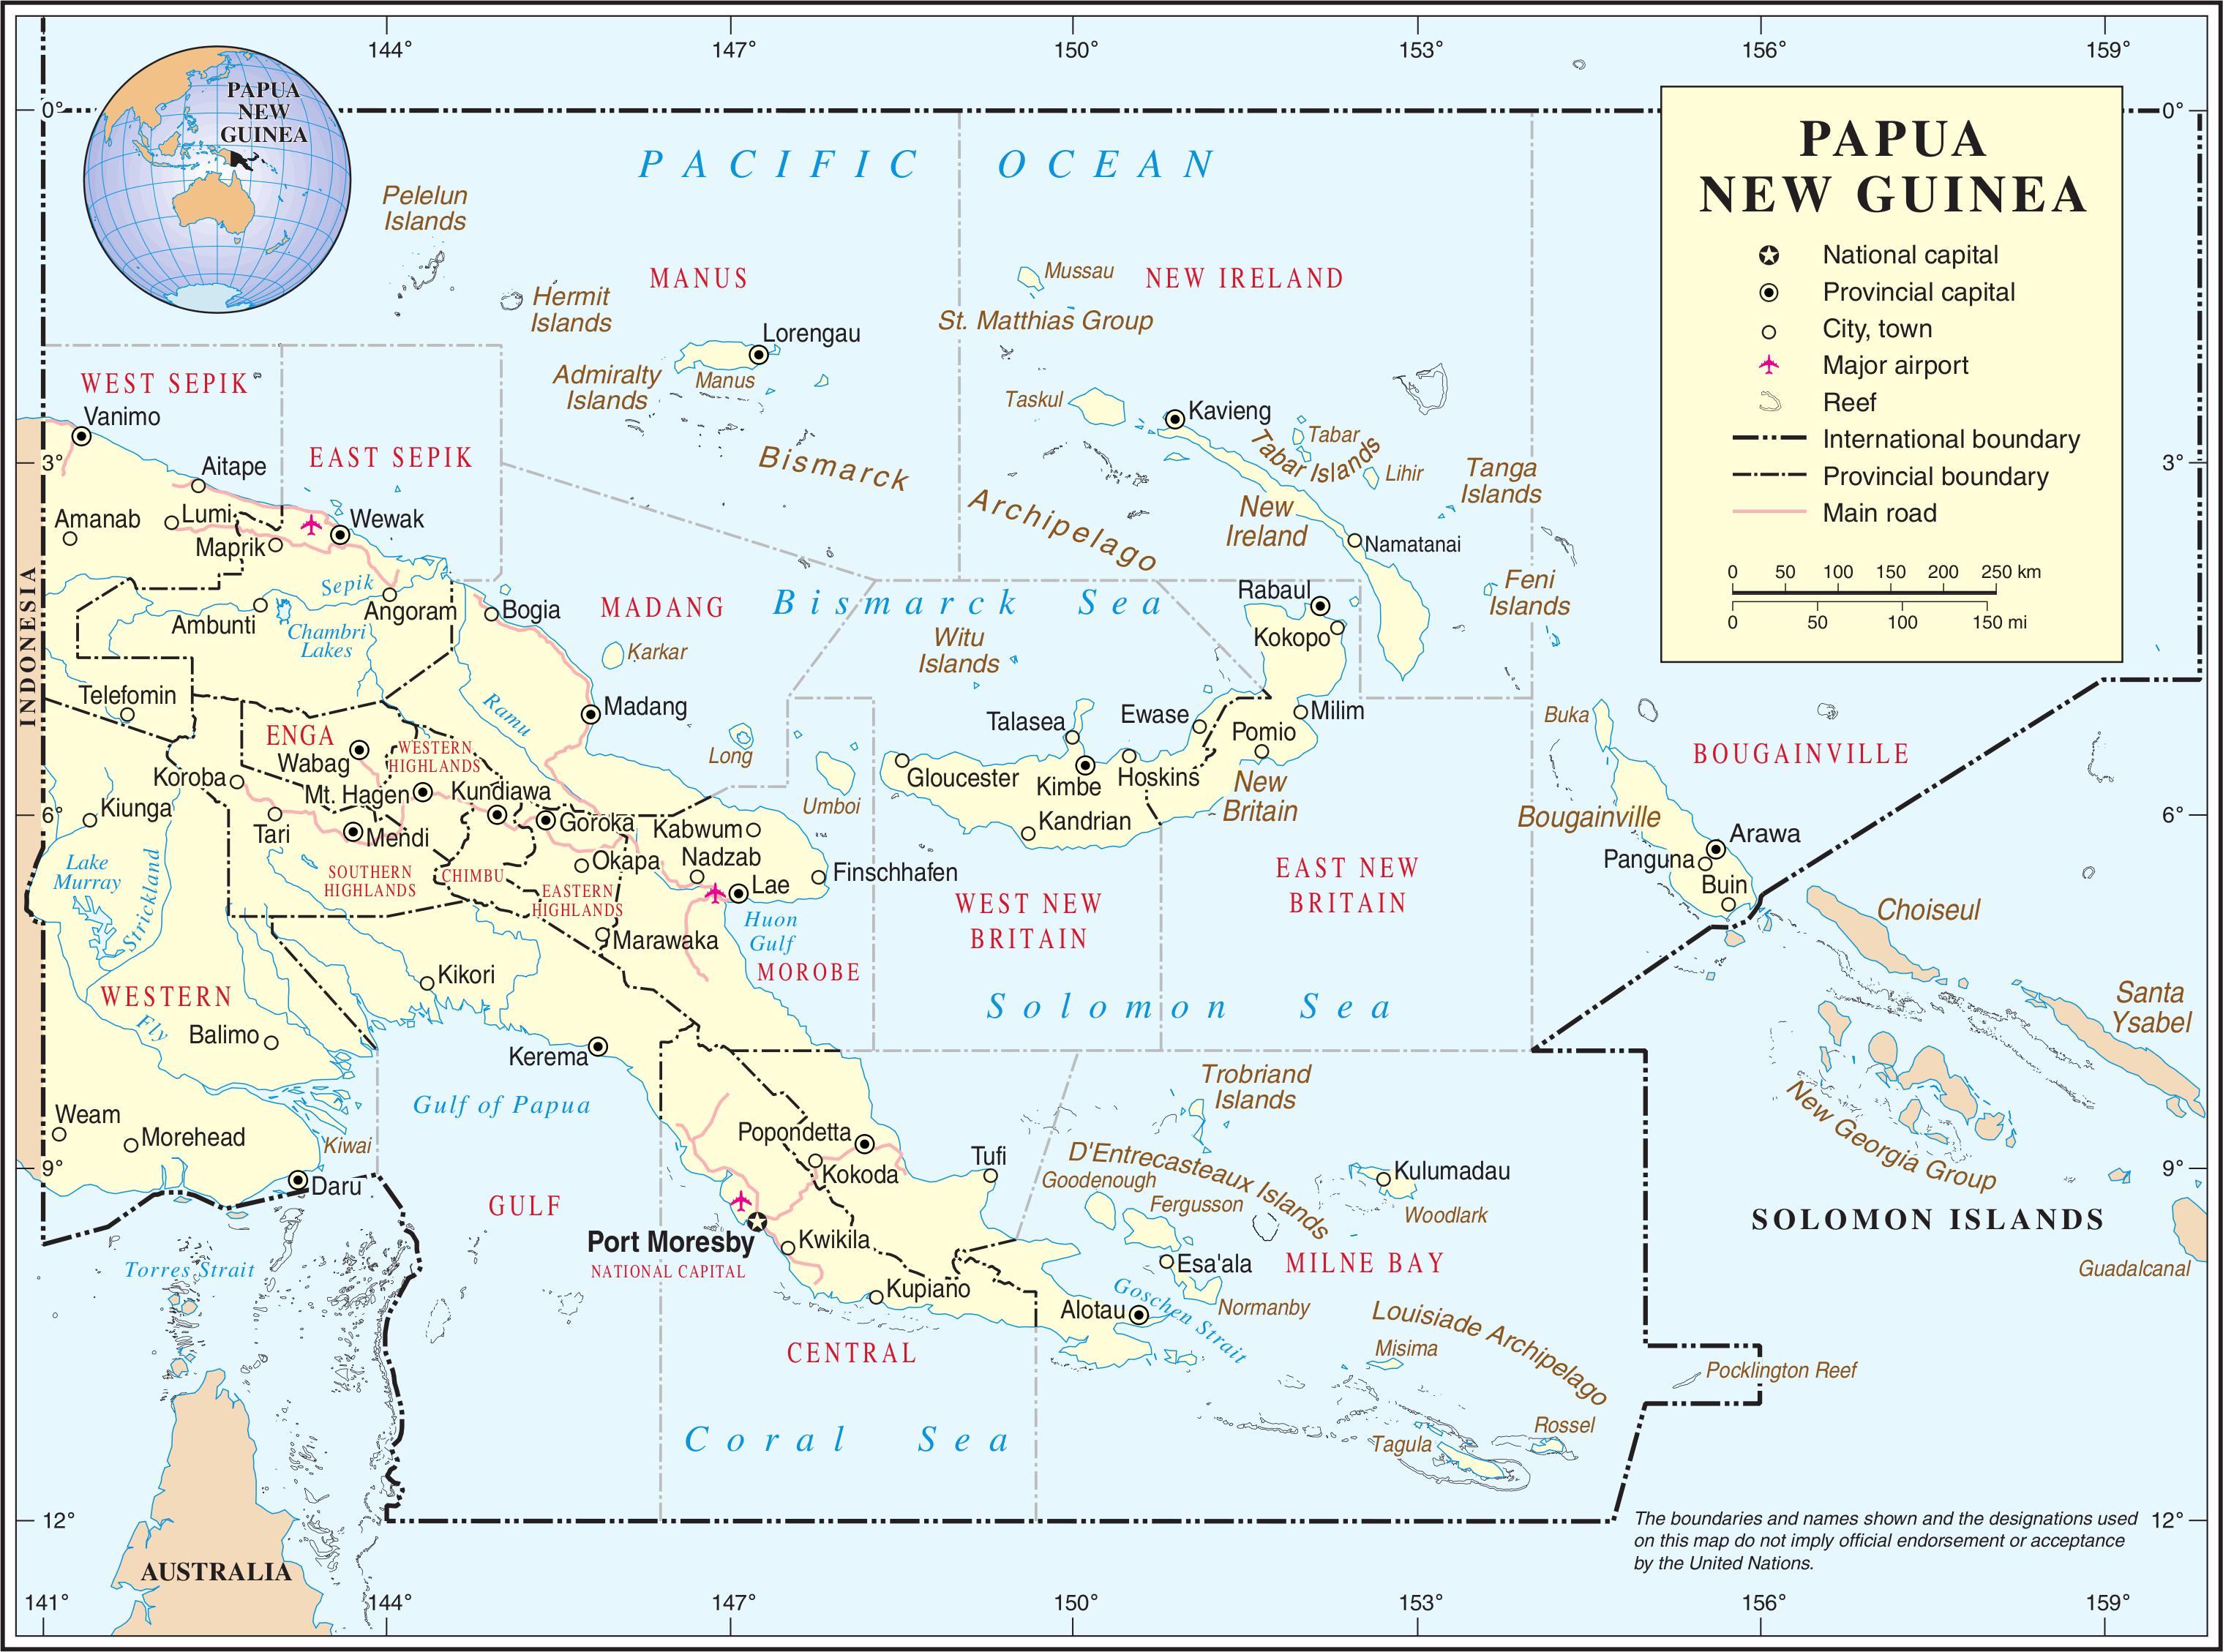 papua neuguinea karte Landkarte Papua Neuguinea (Übersichtskarte) : Weltkarte.